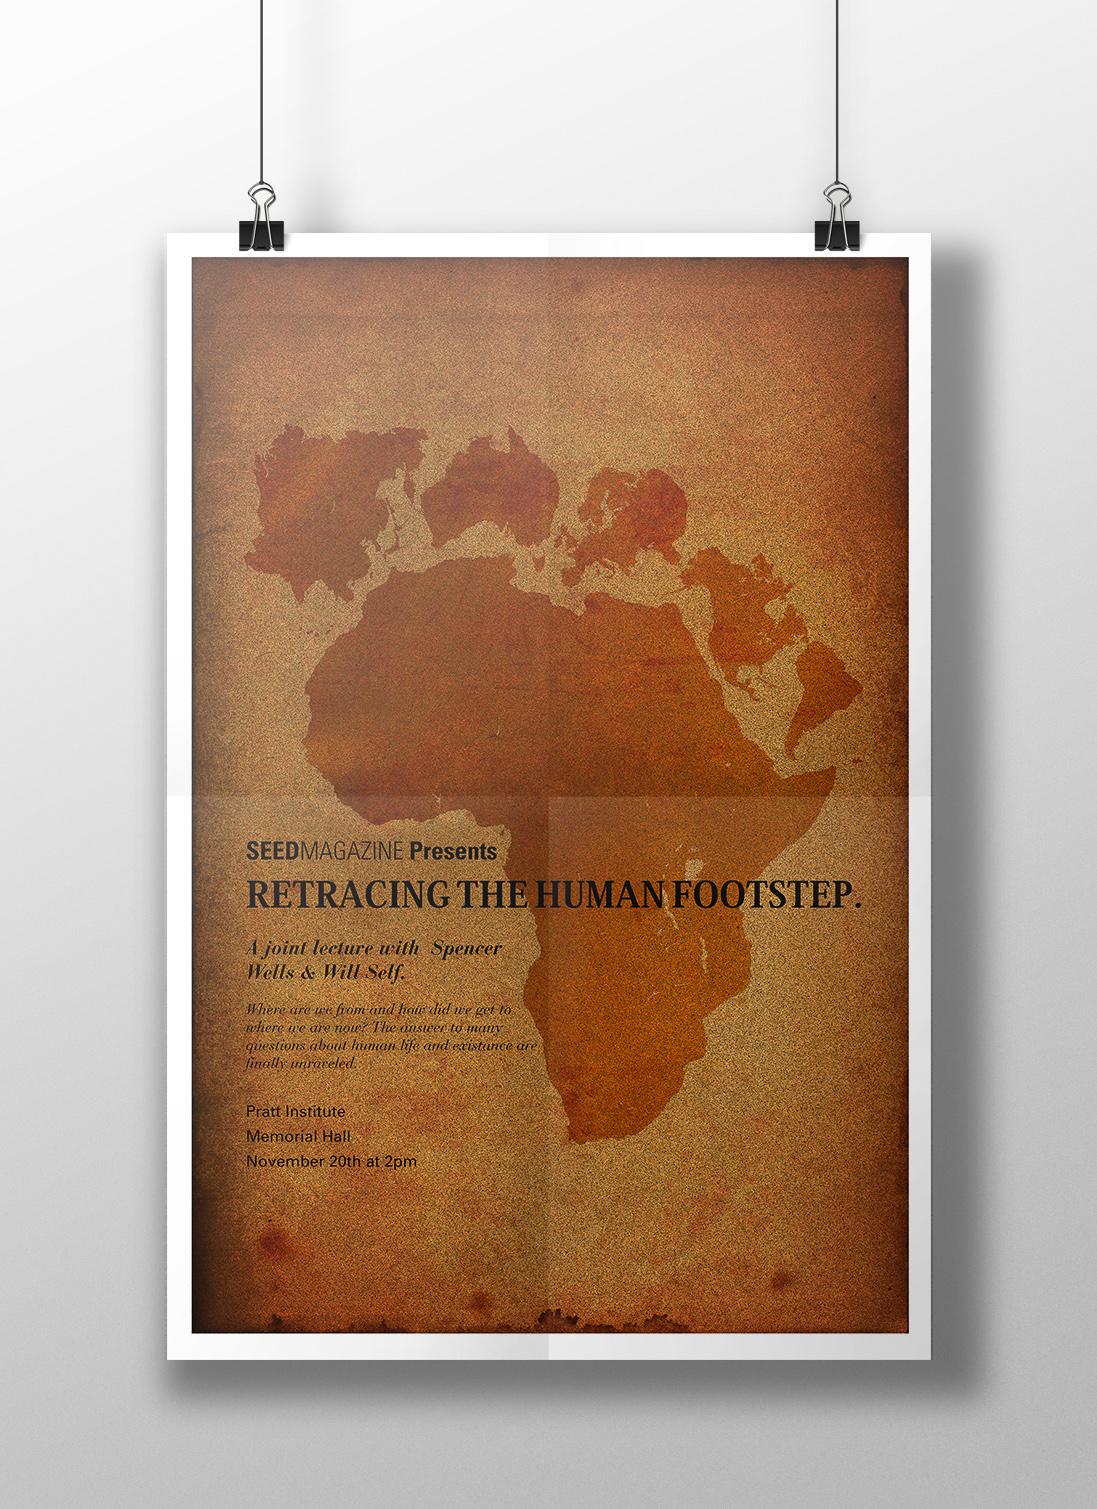 RETRACING THE HUMAN FOOTSTEP